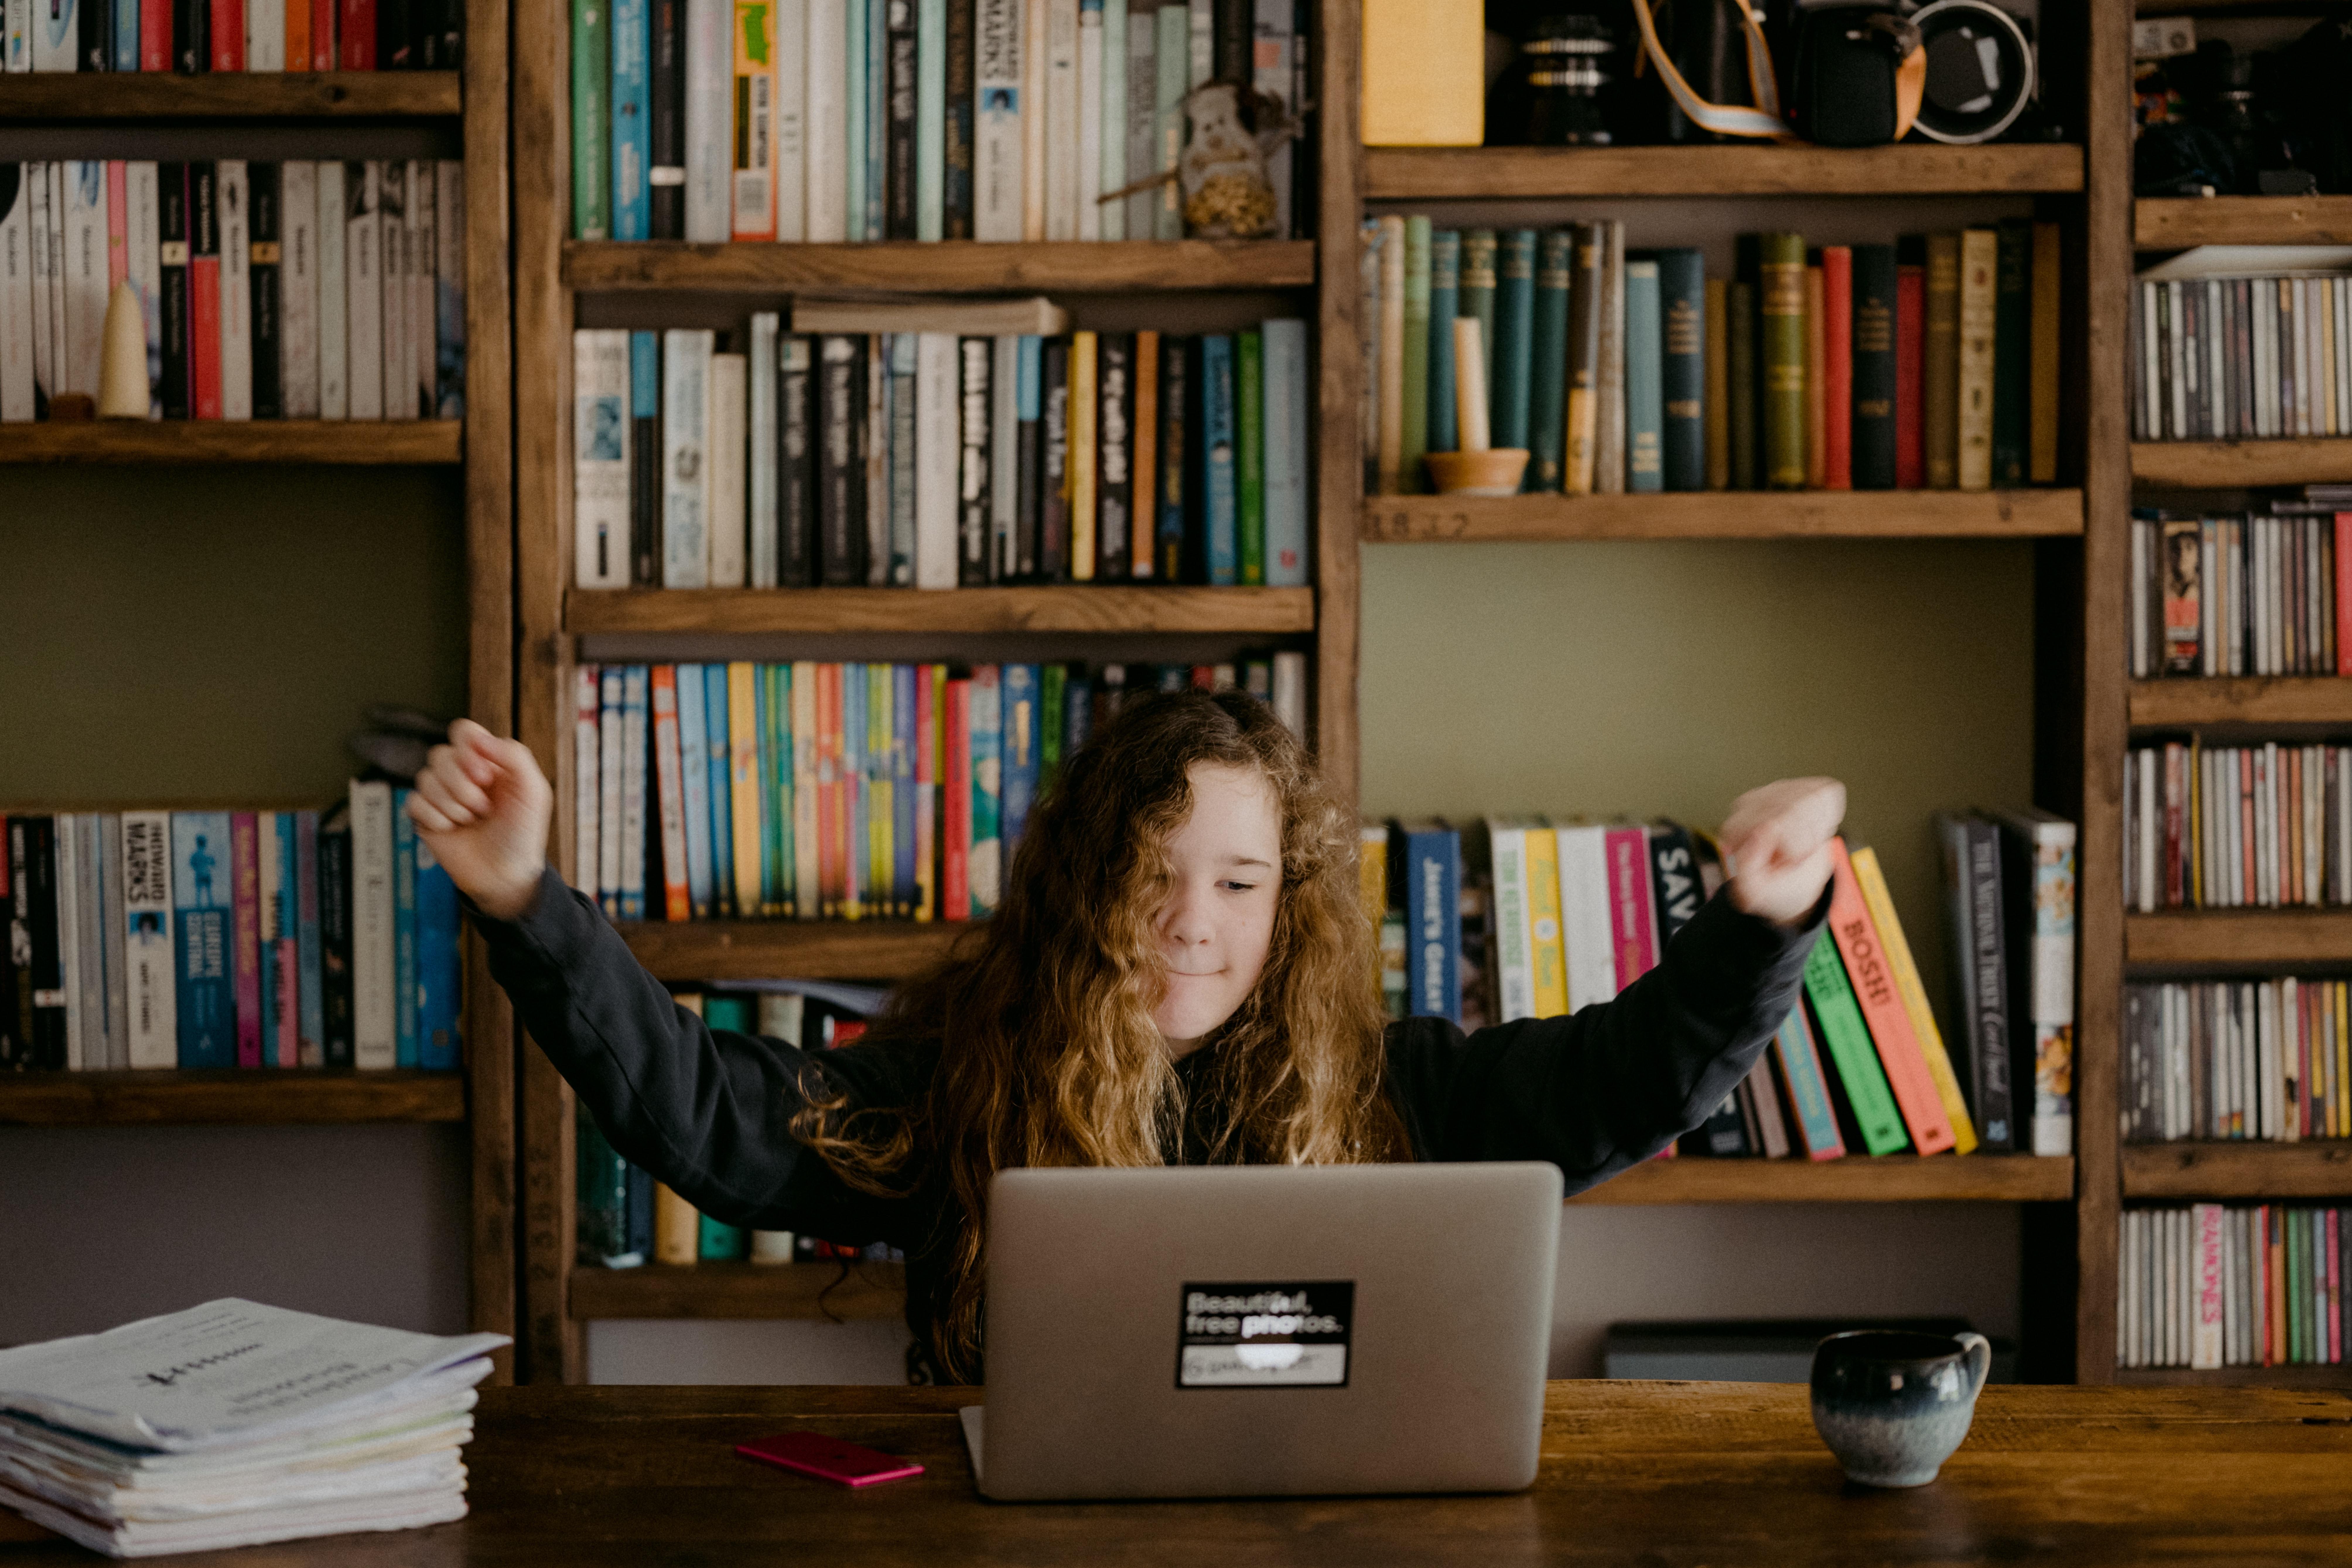 Girl studying on laptop